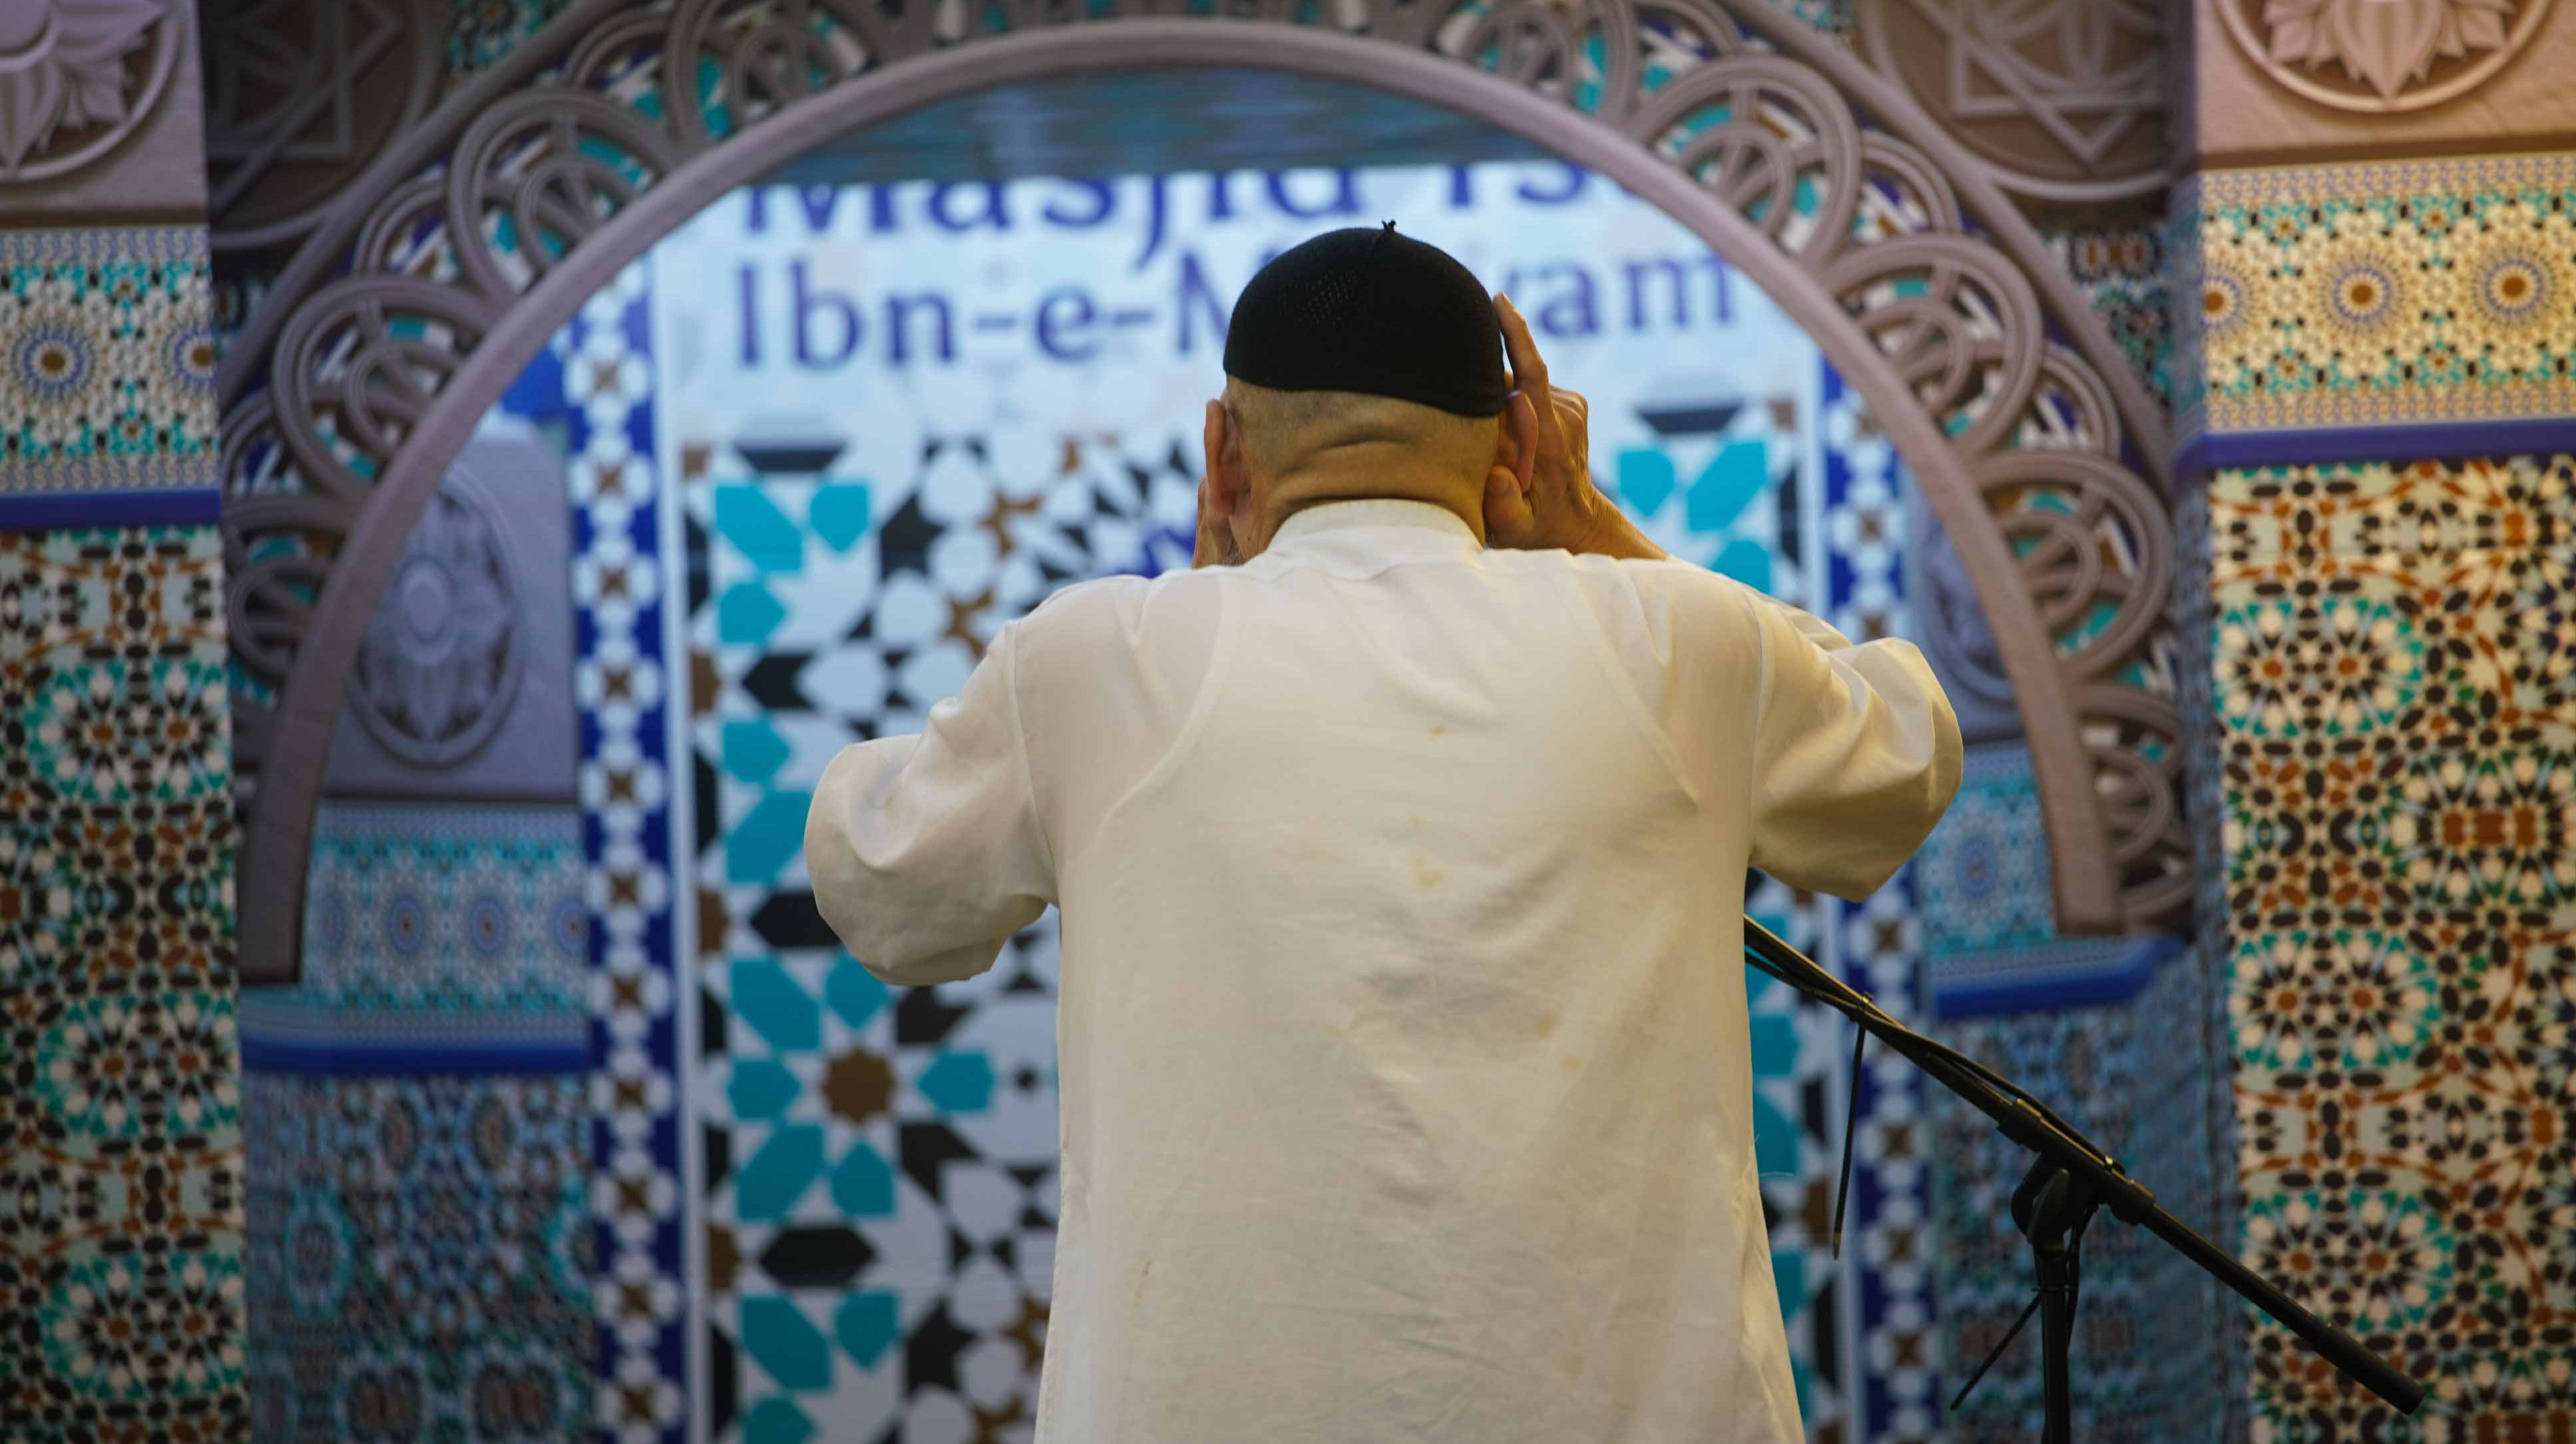 Masjid New Zealand Pinterest: Local Mosque Commemorates New Zealand Shooting Victims